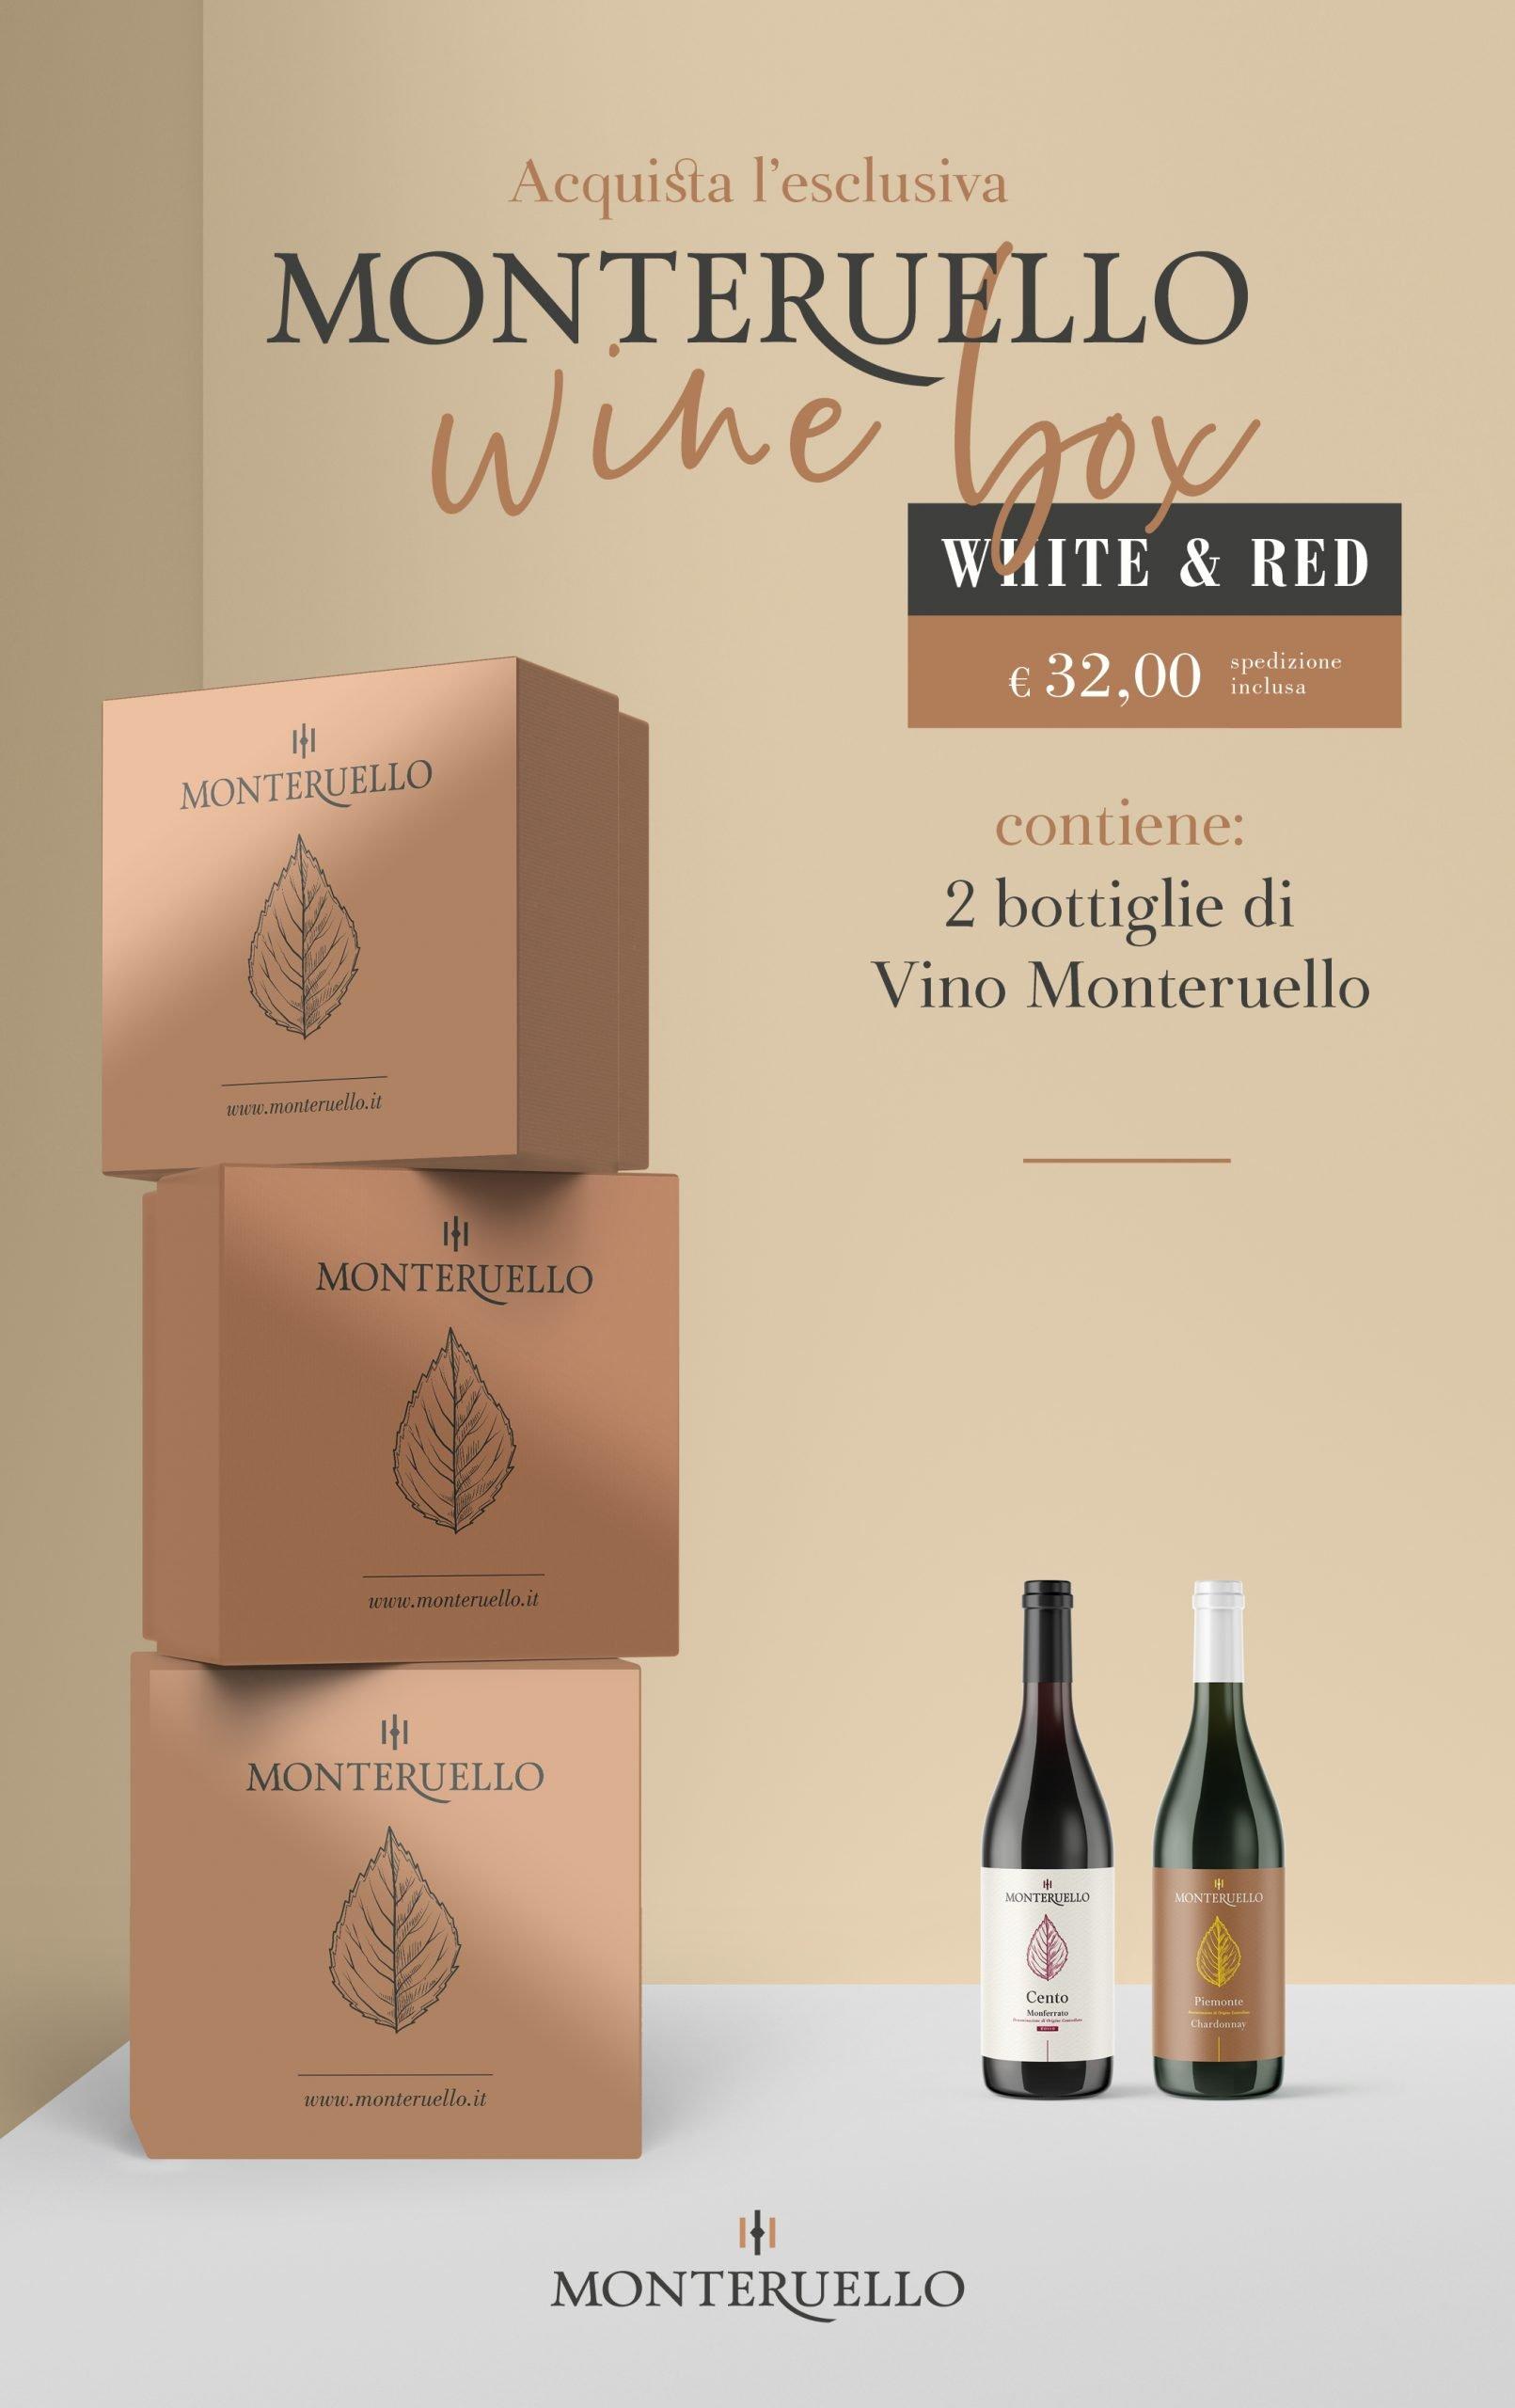 Monteruello | Wine Box | White & Red | www.monteruello.it